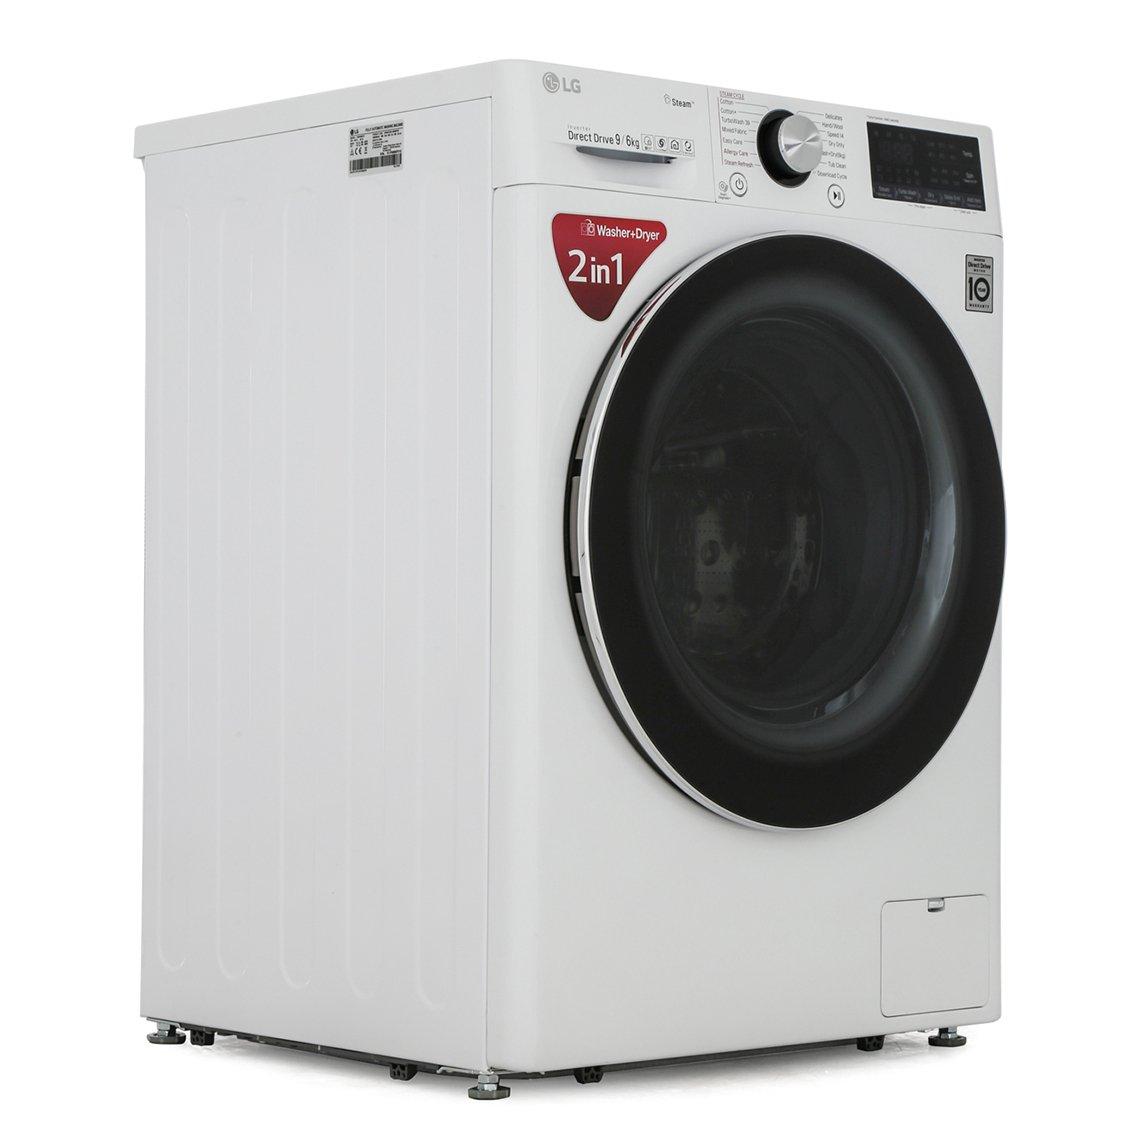 LG FWV996WTS Washer Dryer